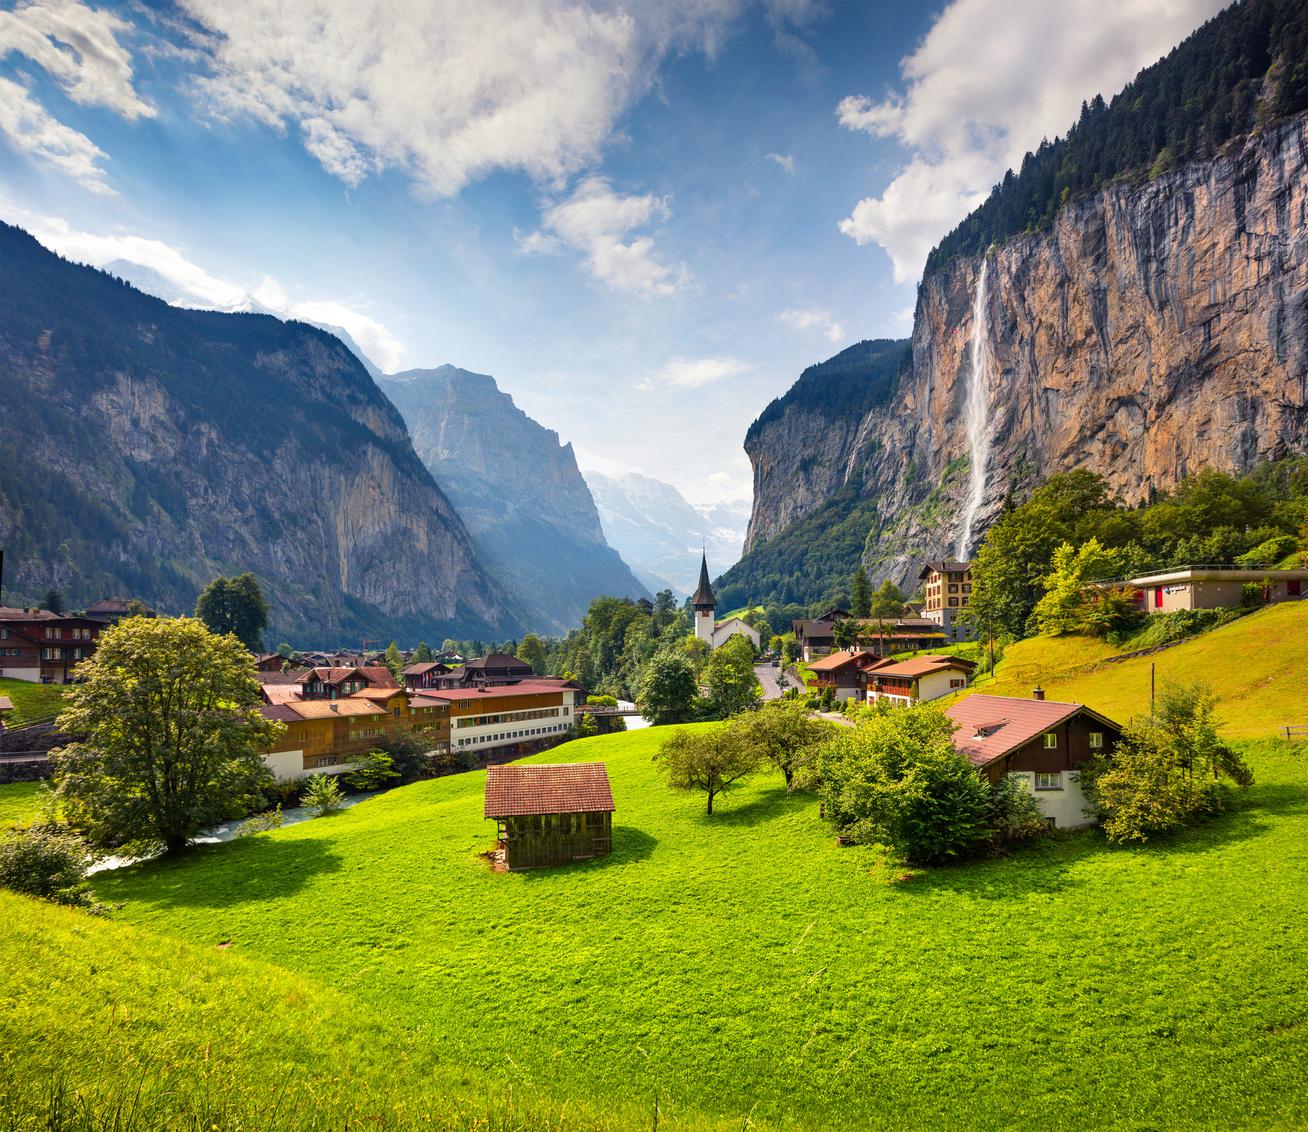 lauterbrunnen-völgy